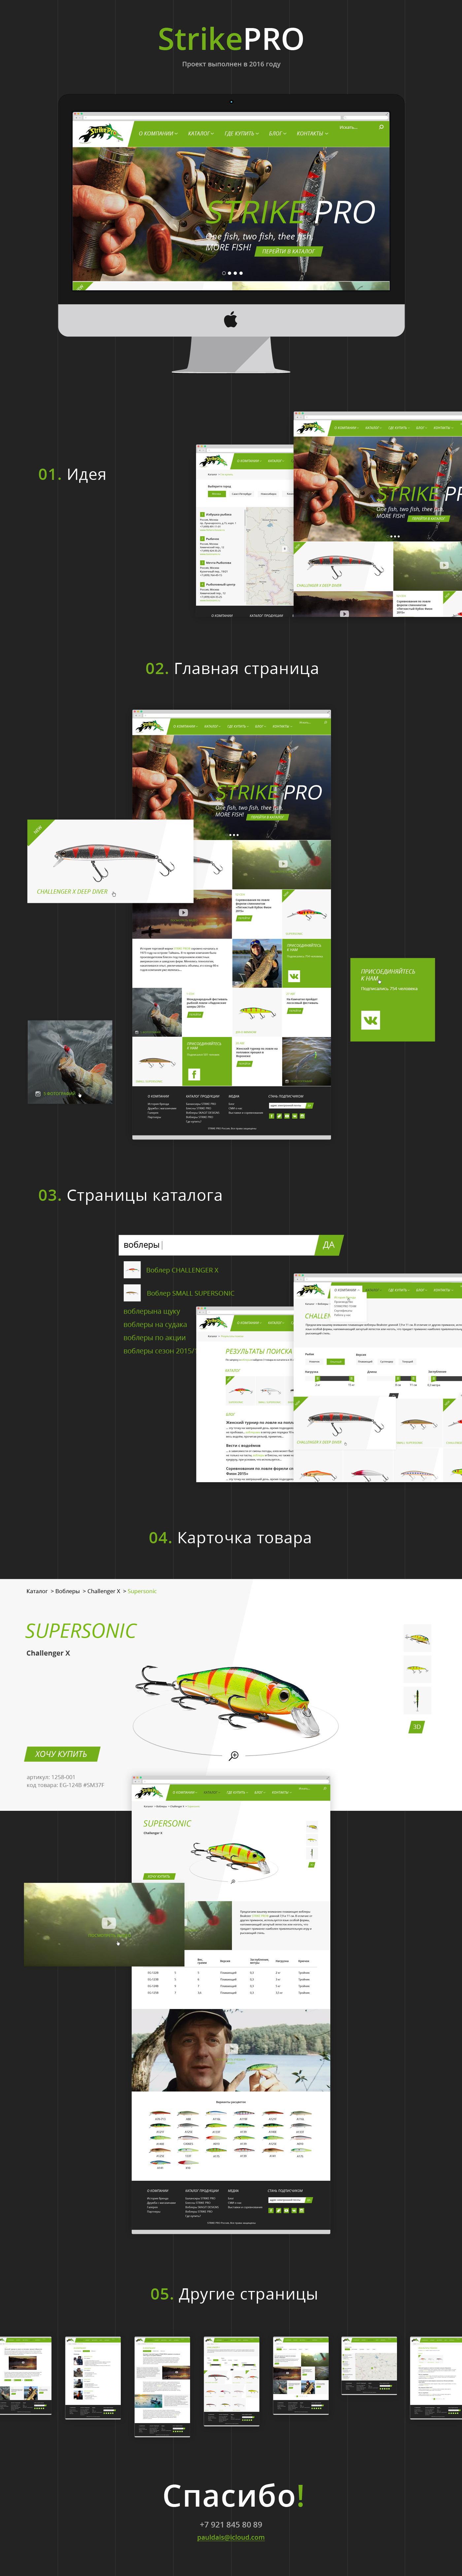 STRIKEPRO, интернет-магазин, рыбалка, охота